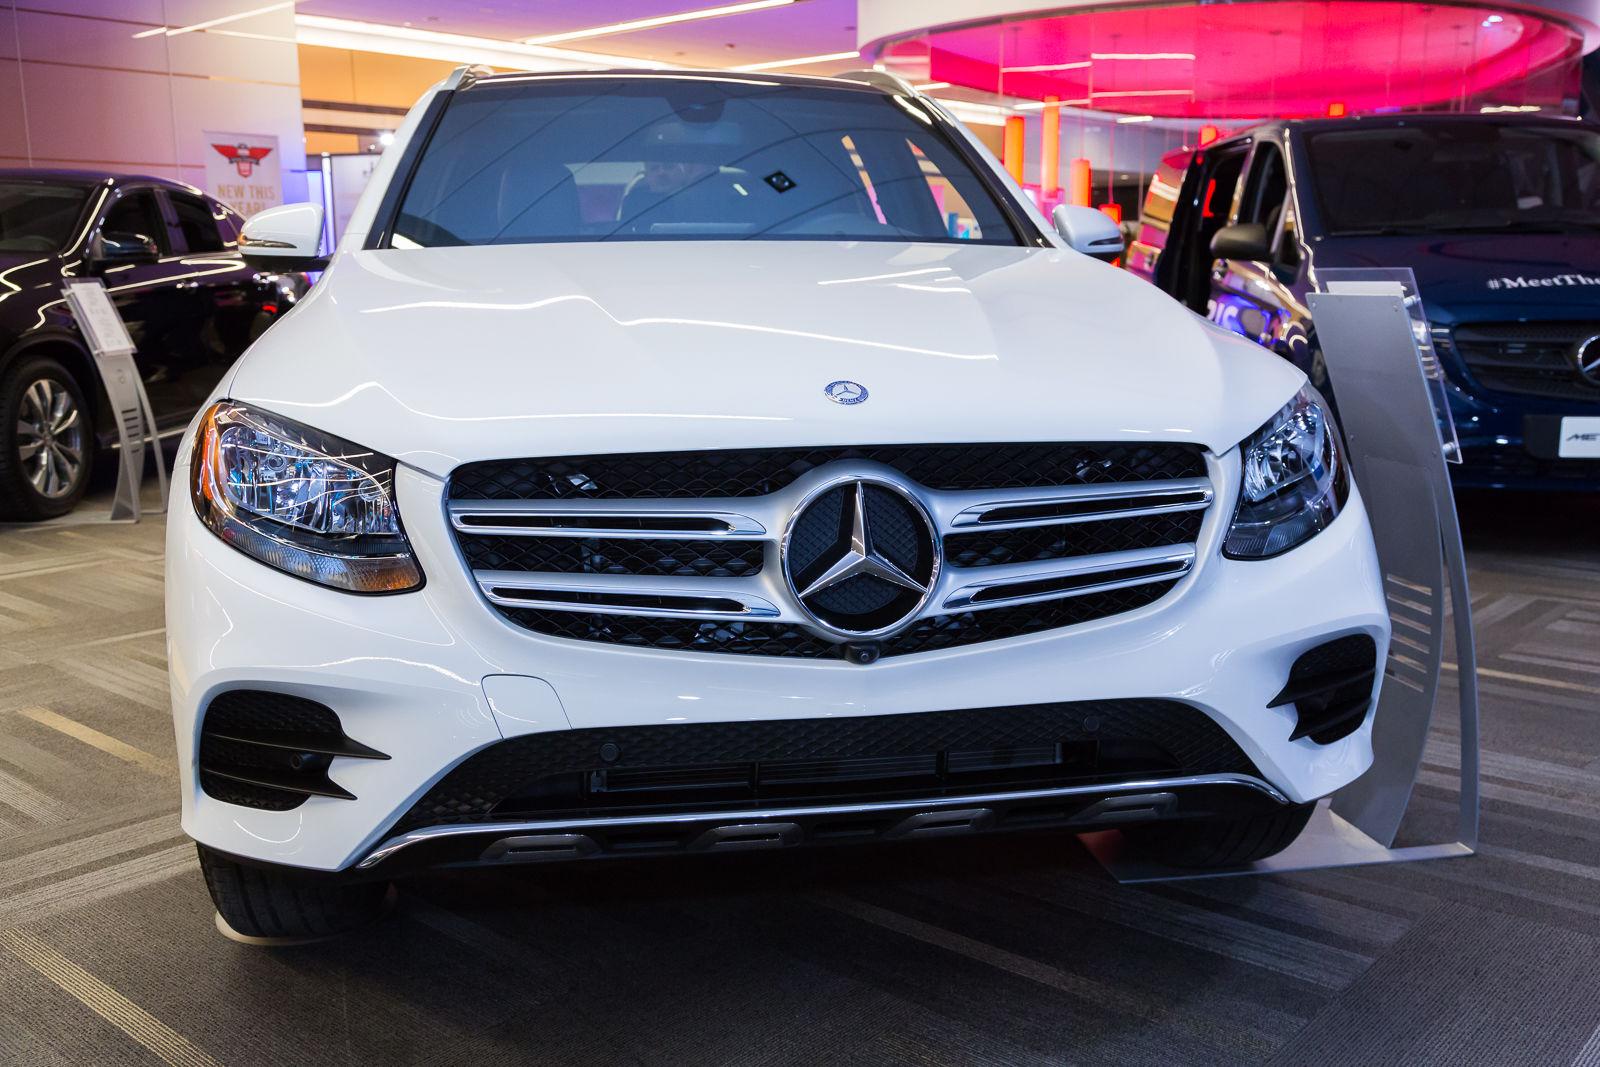 Mercedes Cars At Auto Expo 2016 Mercedes Benz At Delhi: Ottawa Auto Show: 2016 Mercedes-Benz GLC By